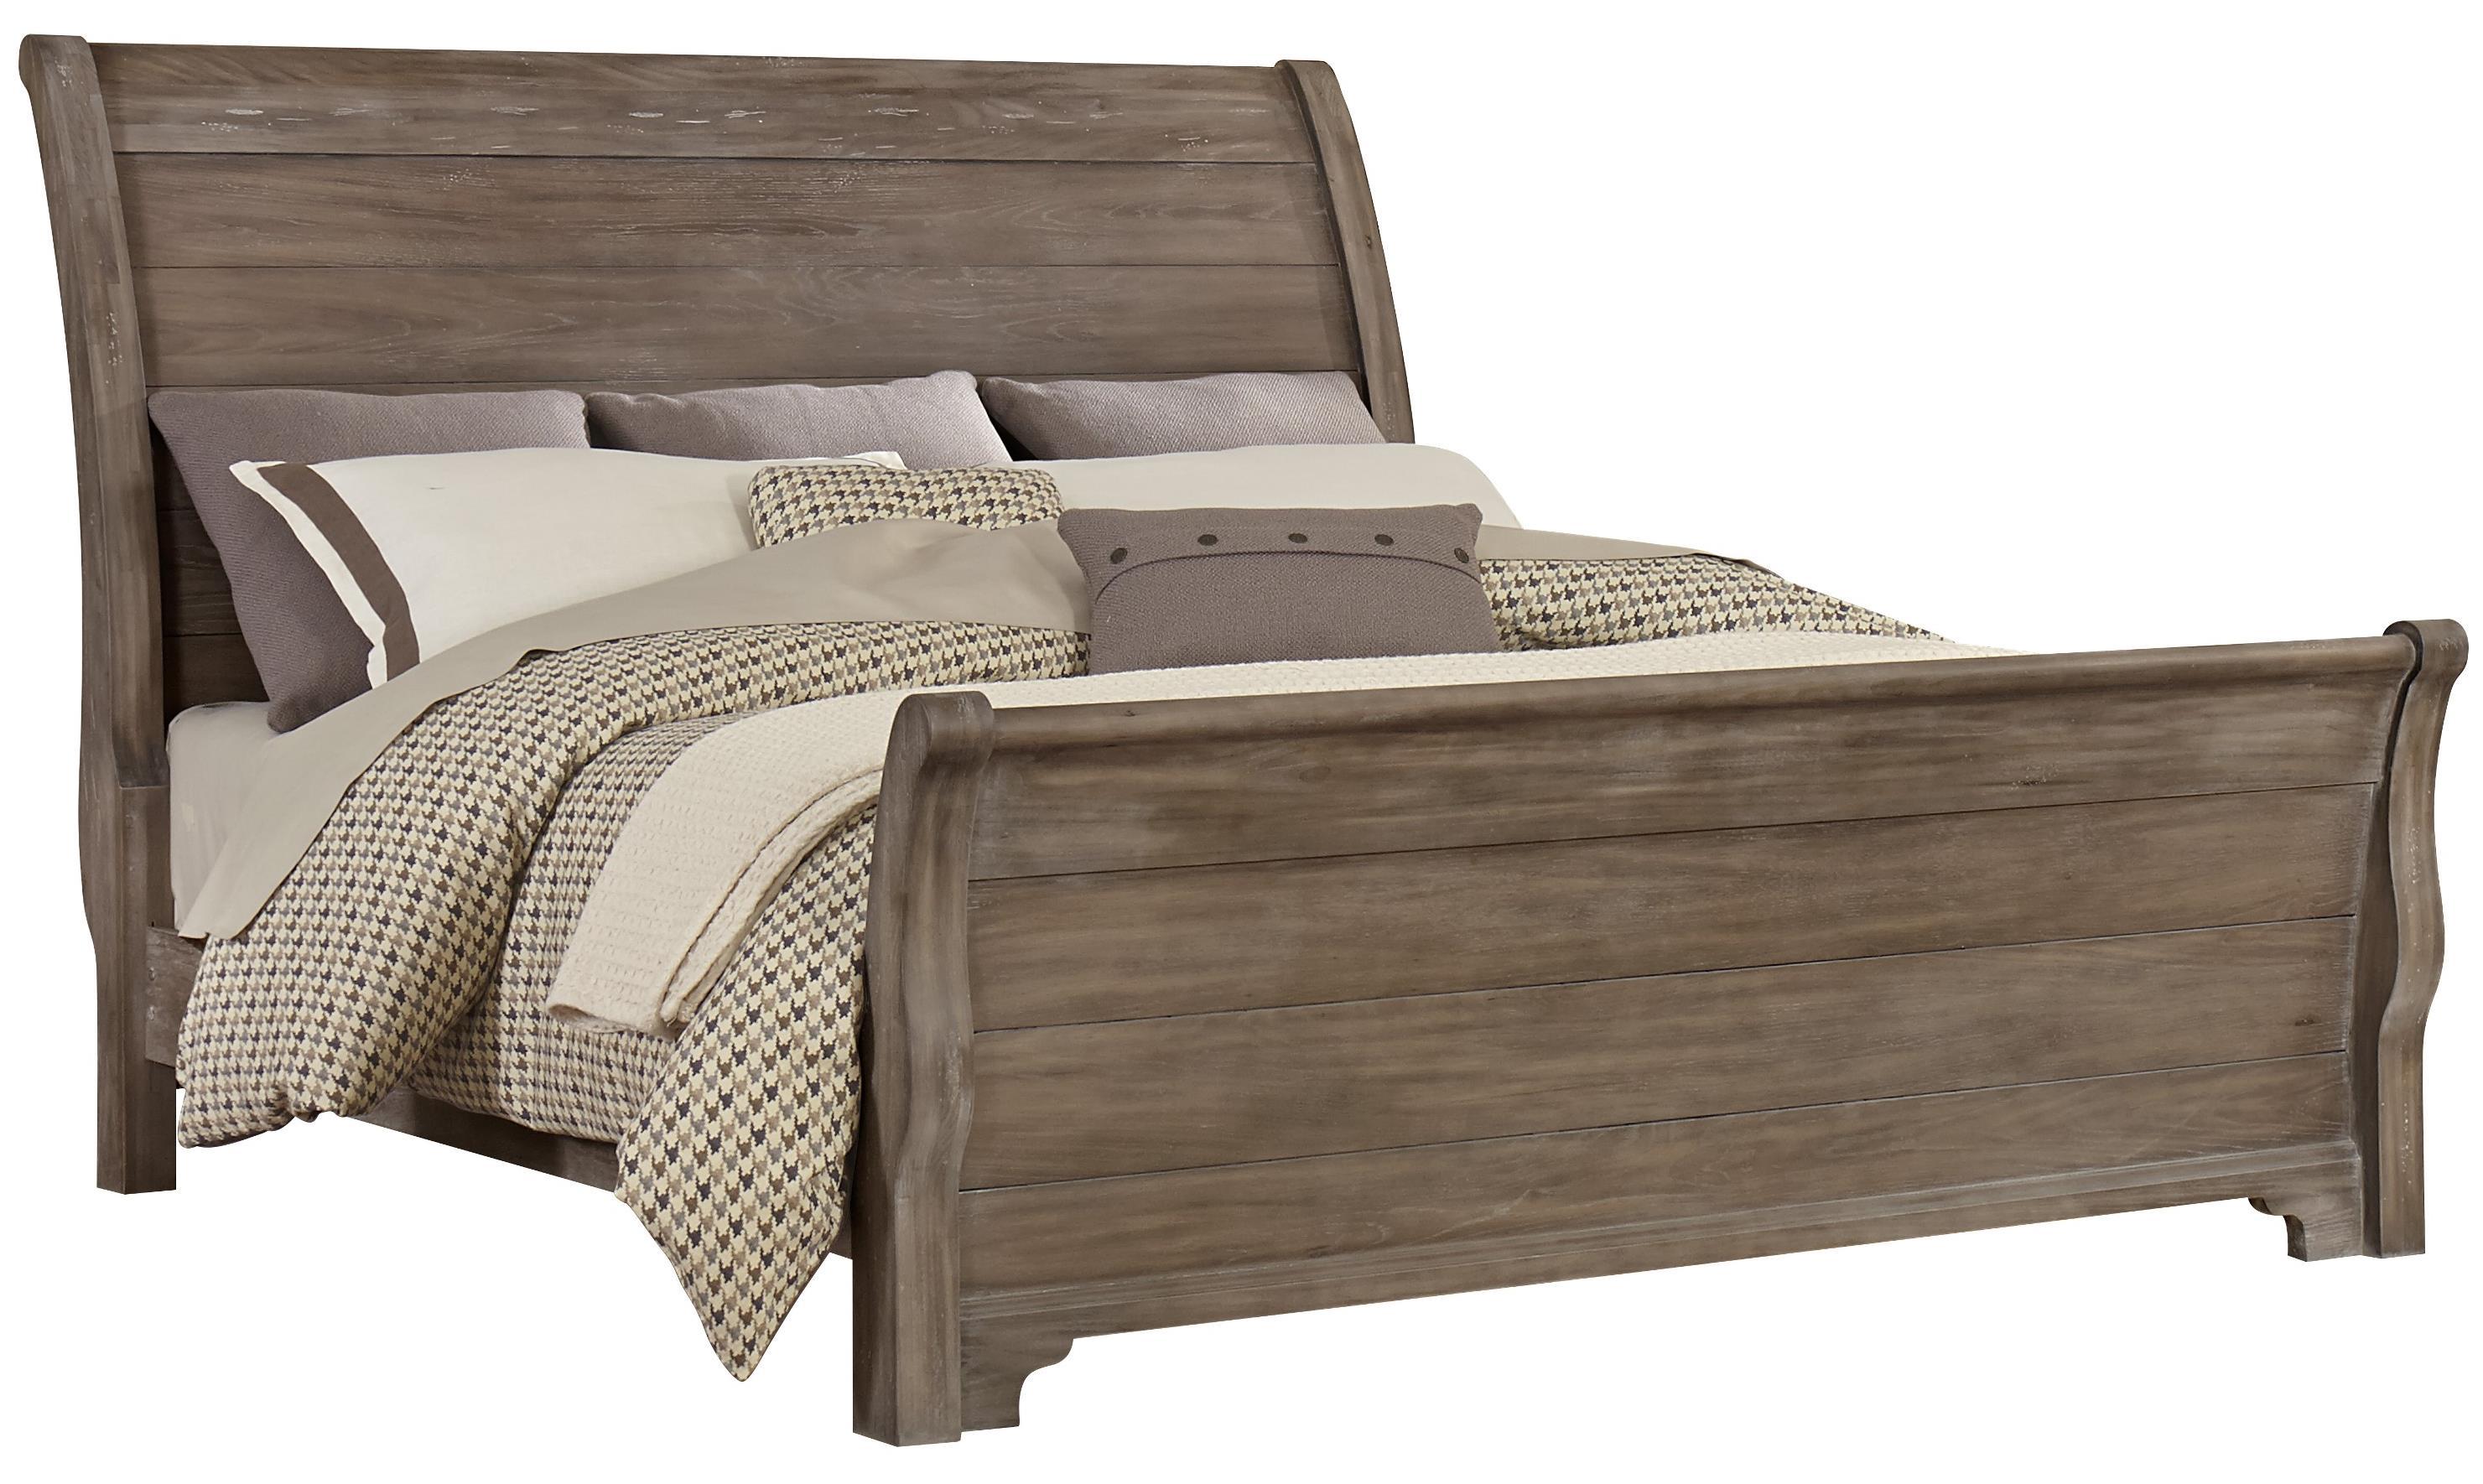 Virginia House Whiskey BarrelQueen Sleigh Bed